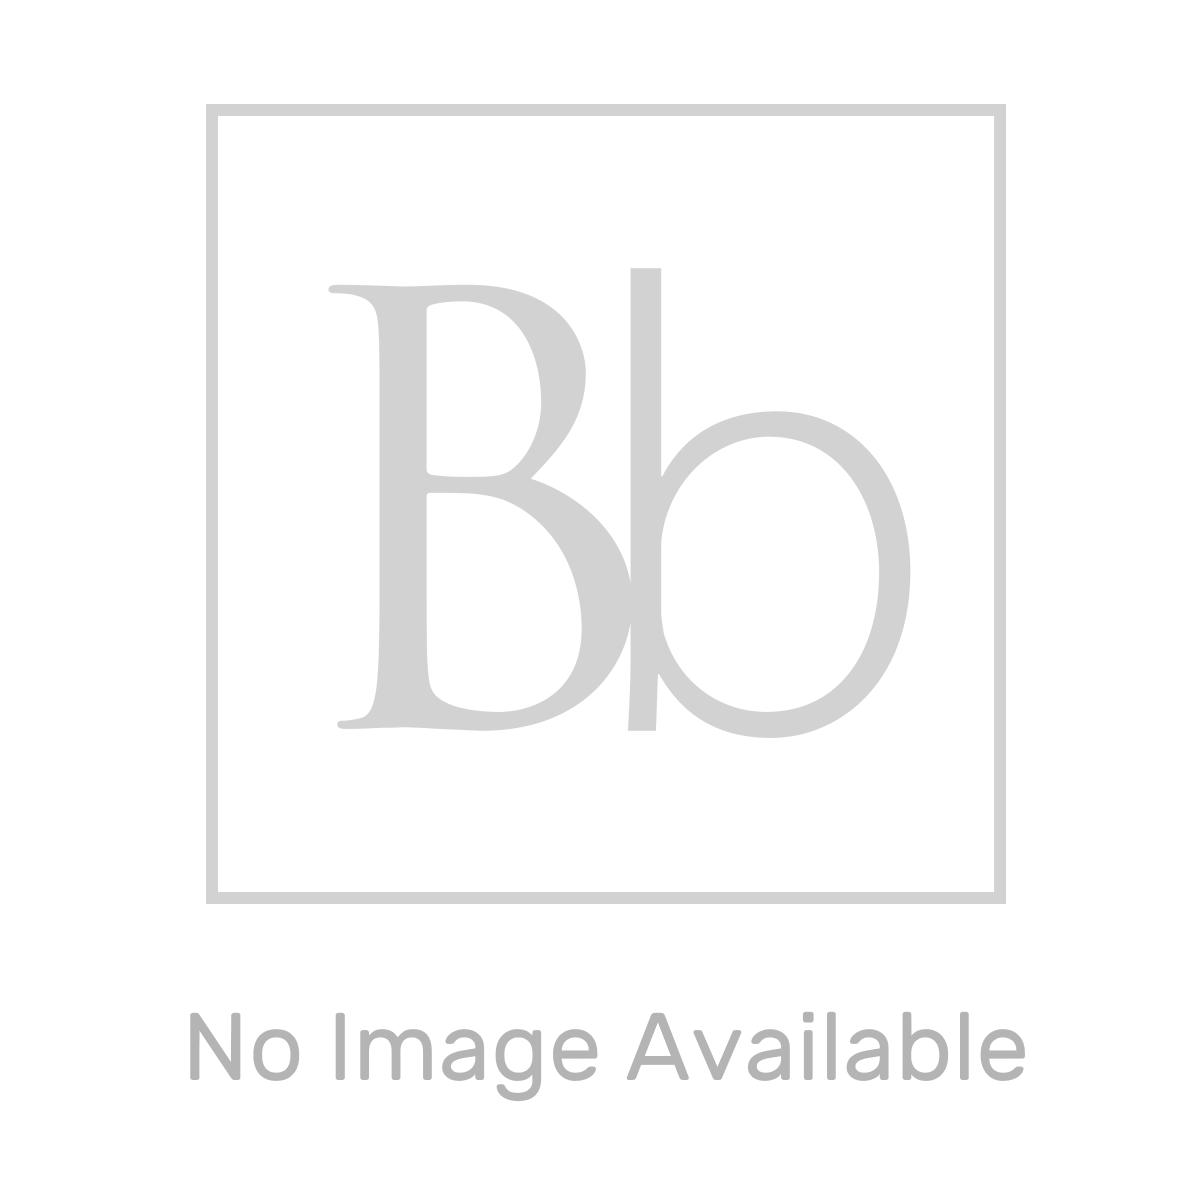 BTL White Laurus² 1 Tap Hole Basin with Full Pedestal 500mm